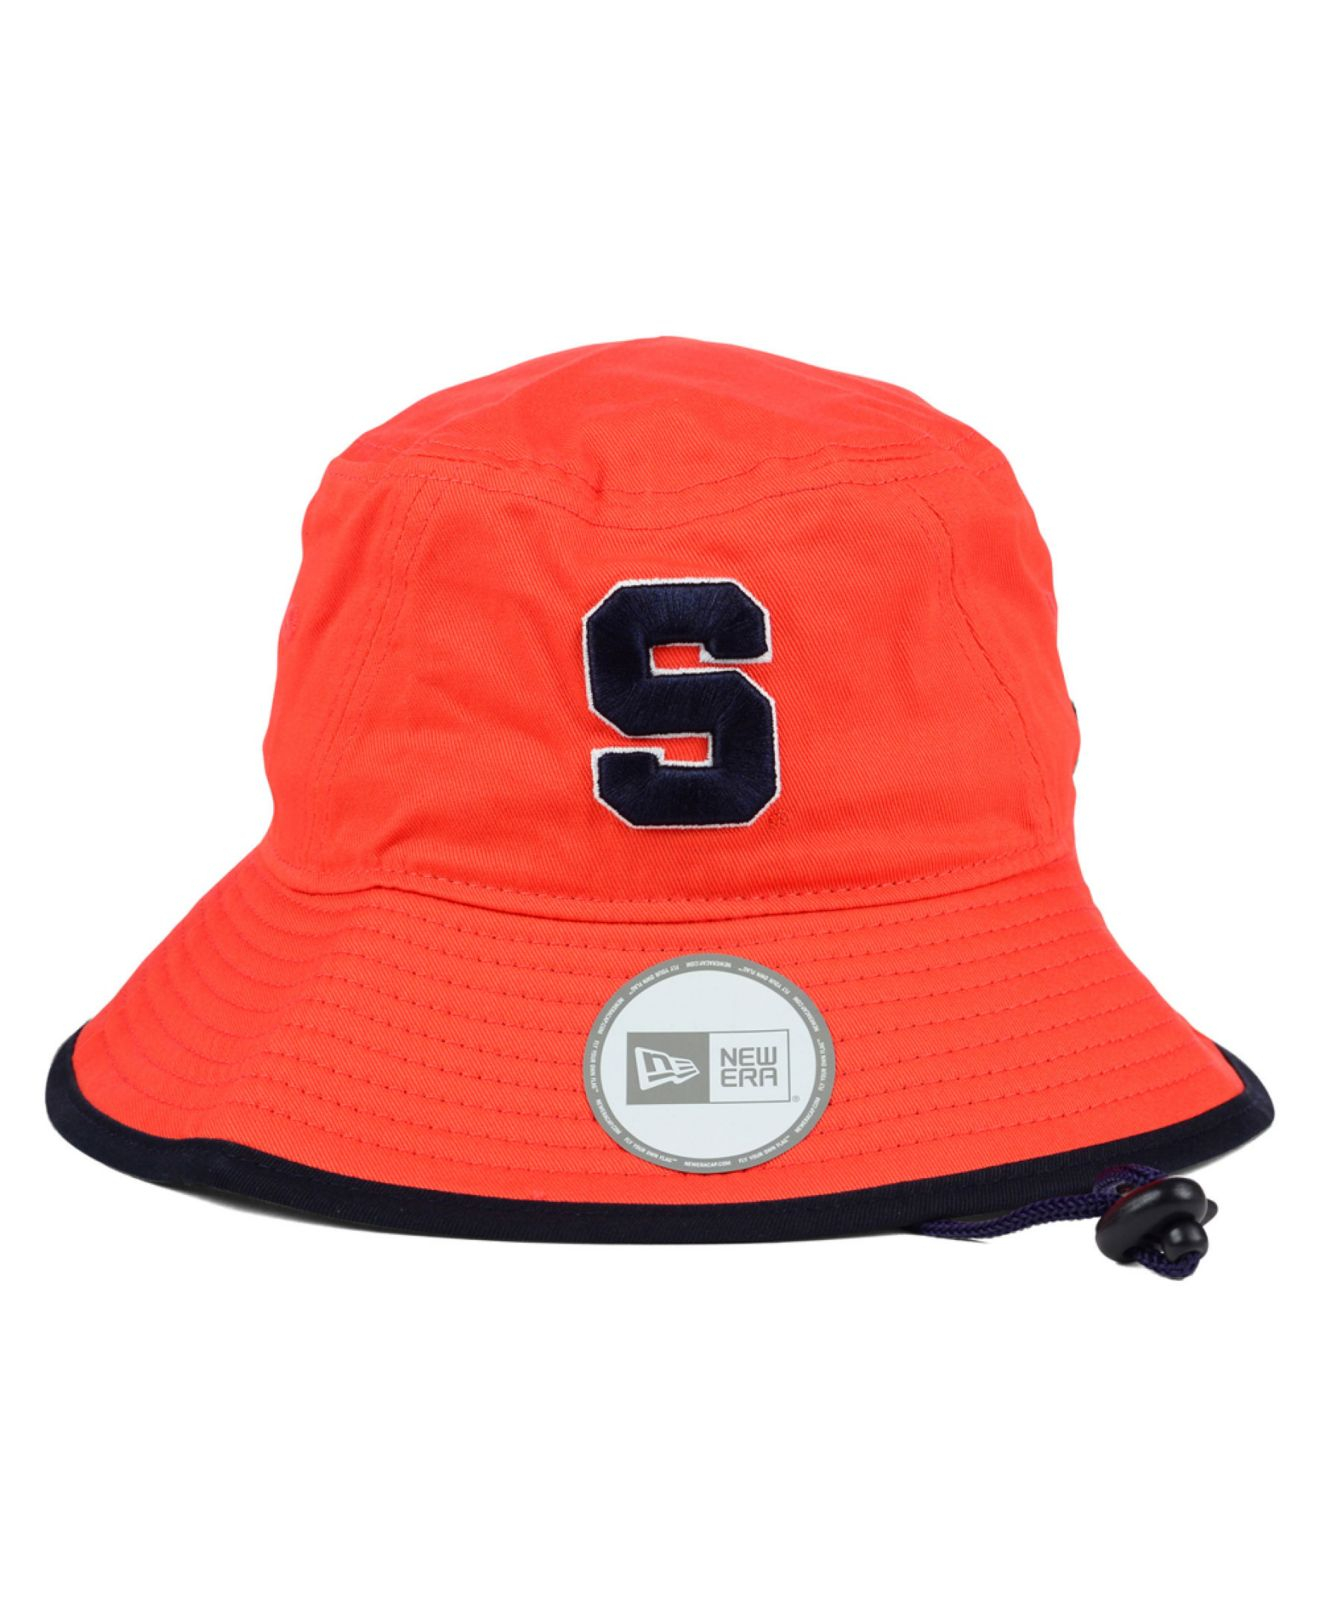 sports shoes 8e4ea 40739 ... spain lyst ktz syracuse orange tip bucket hat in orange for men 45d0c  64d36